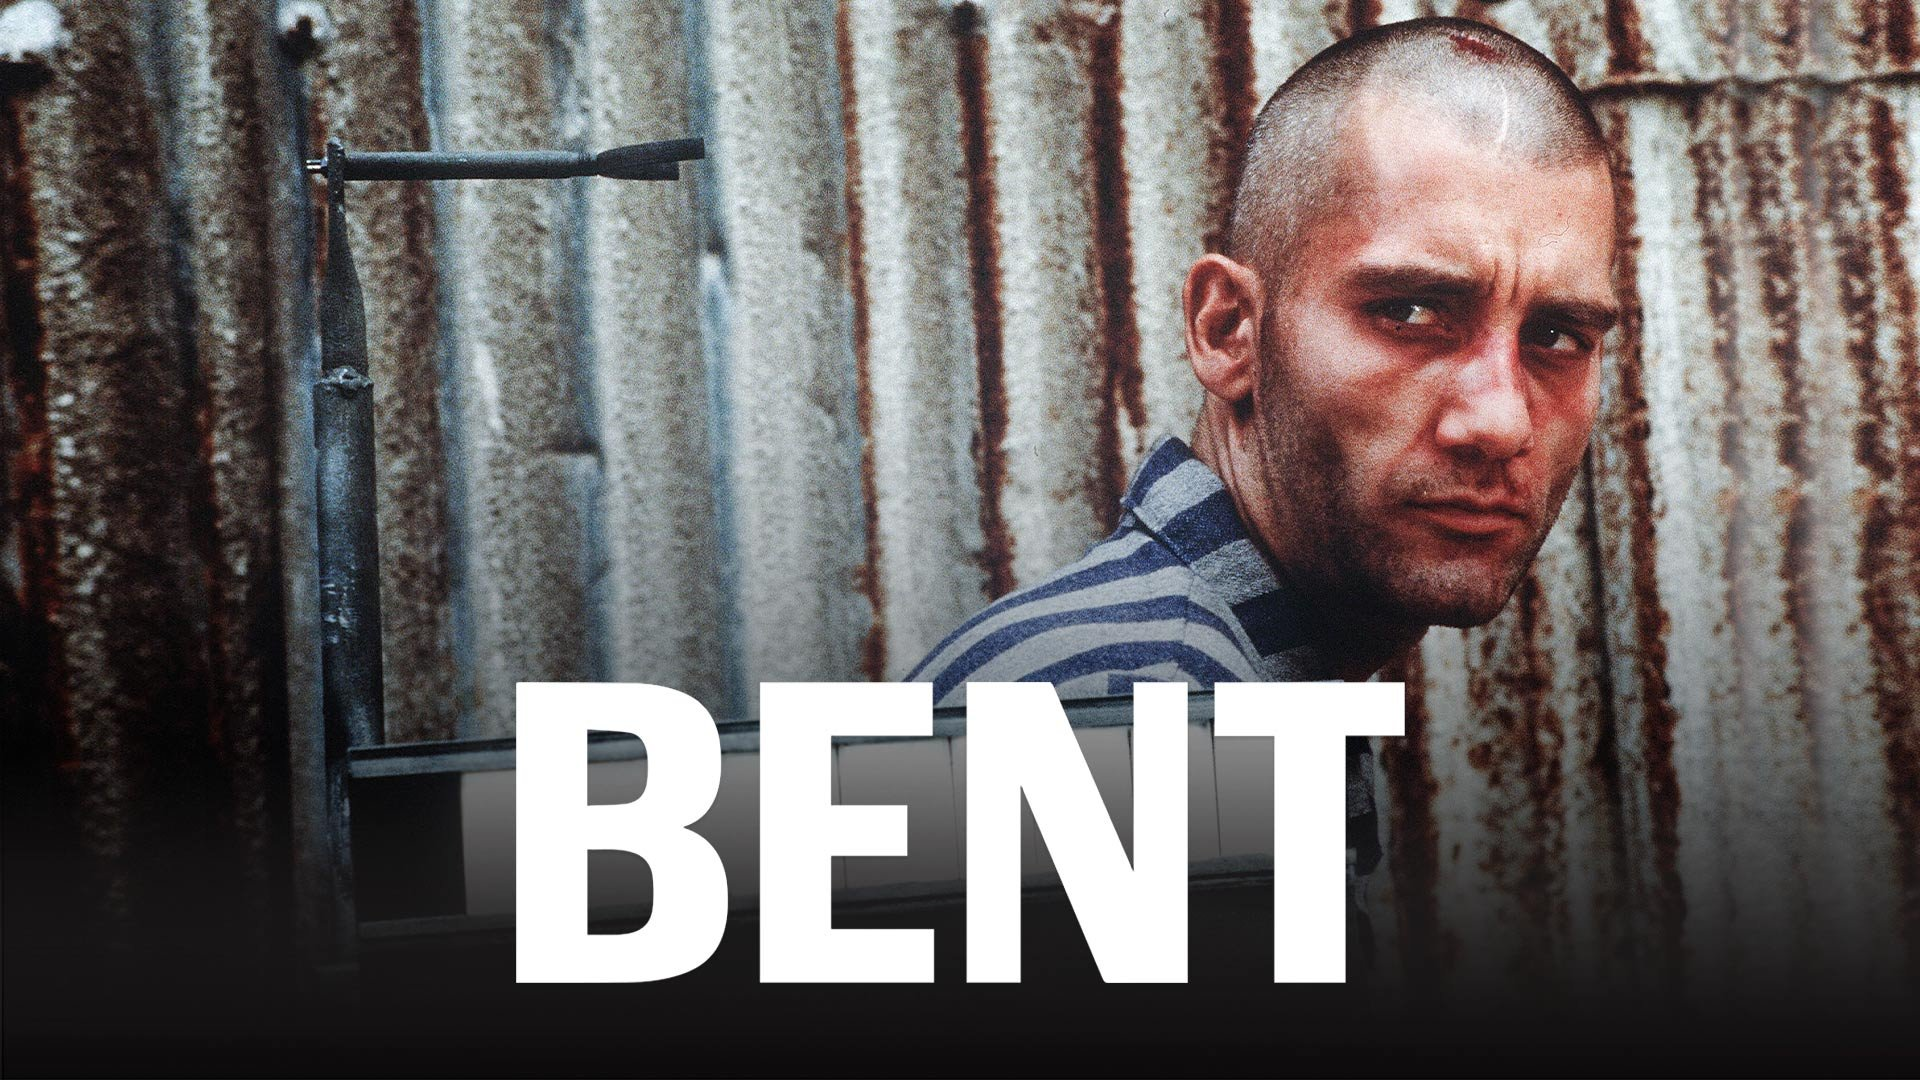 Bent on BritBox UK